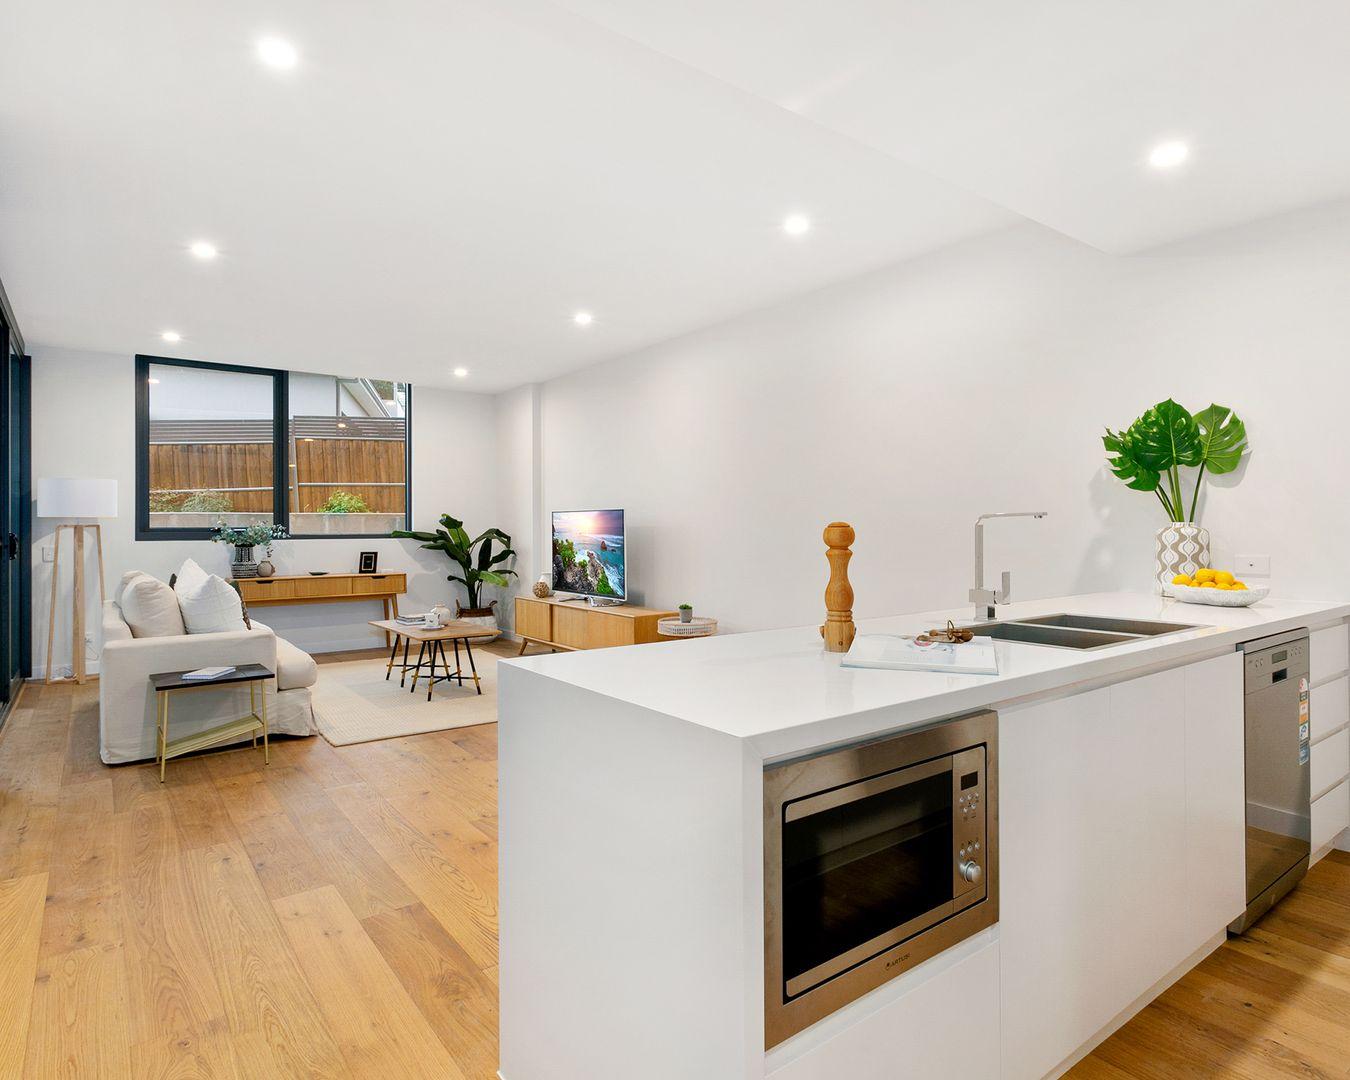 G02/41-45 Yattenden Crescent, Baulkham Hills NSW 2153, Image 0